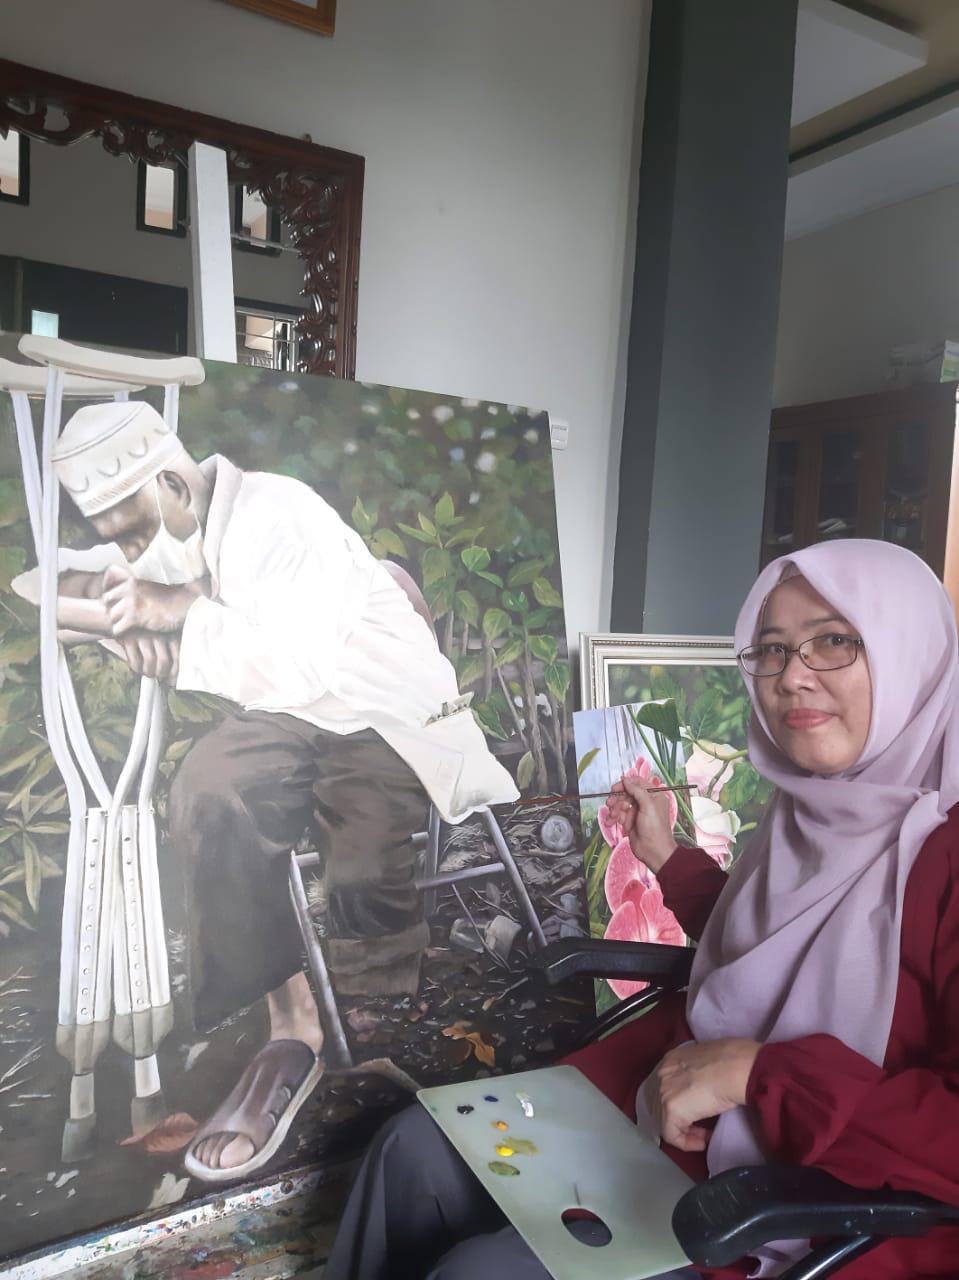 Yuni Daud, Wakili Bengkulu di Pameran Daring Galnasonline.id